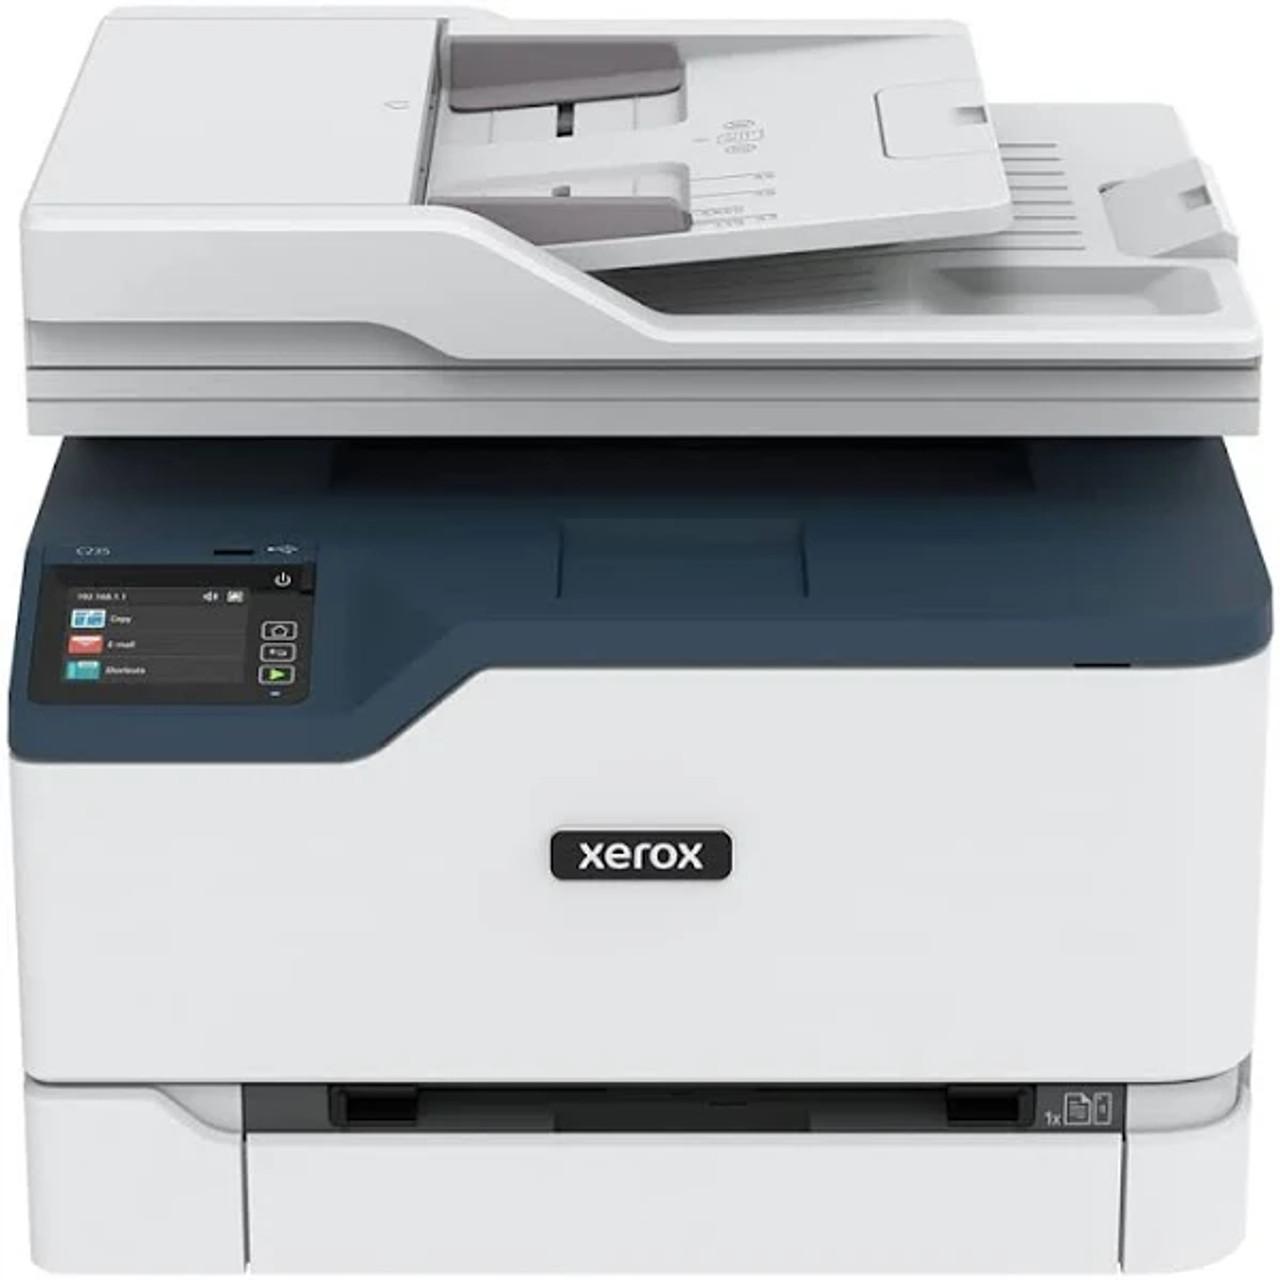 Xerox C235 Laser Multifunction Printer - Color